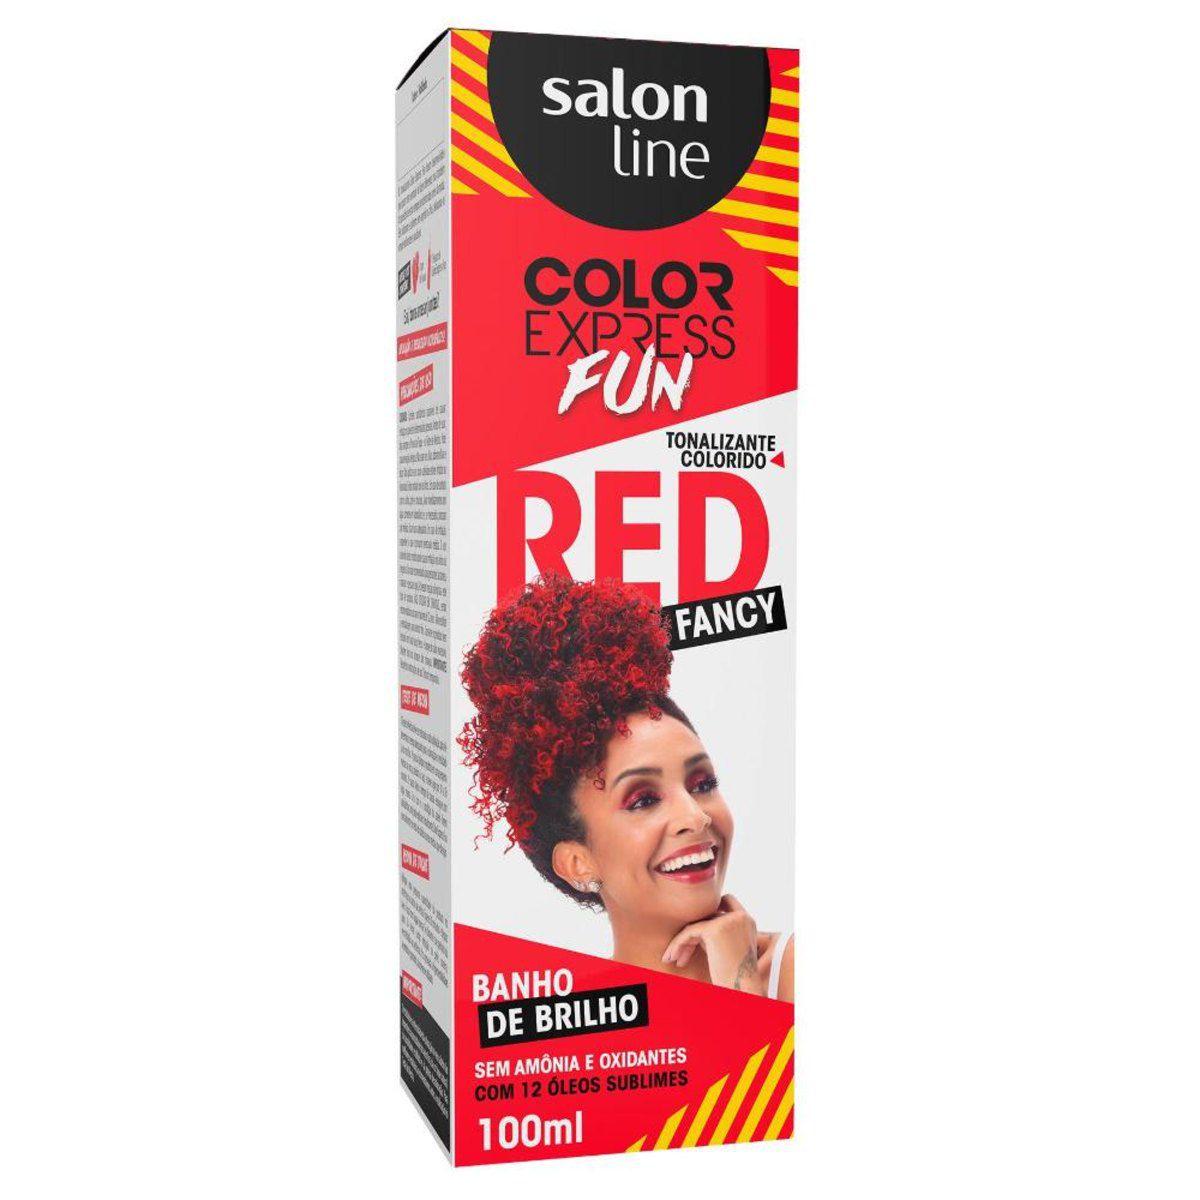 Salon Line Banho de Brilho Color Express Fun Fancy Red 100mL